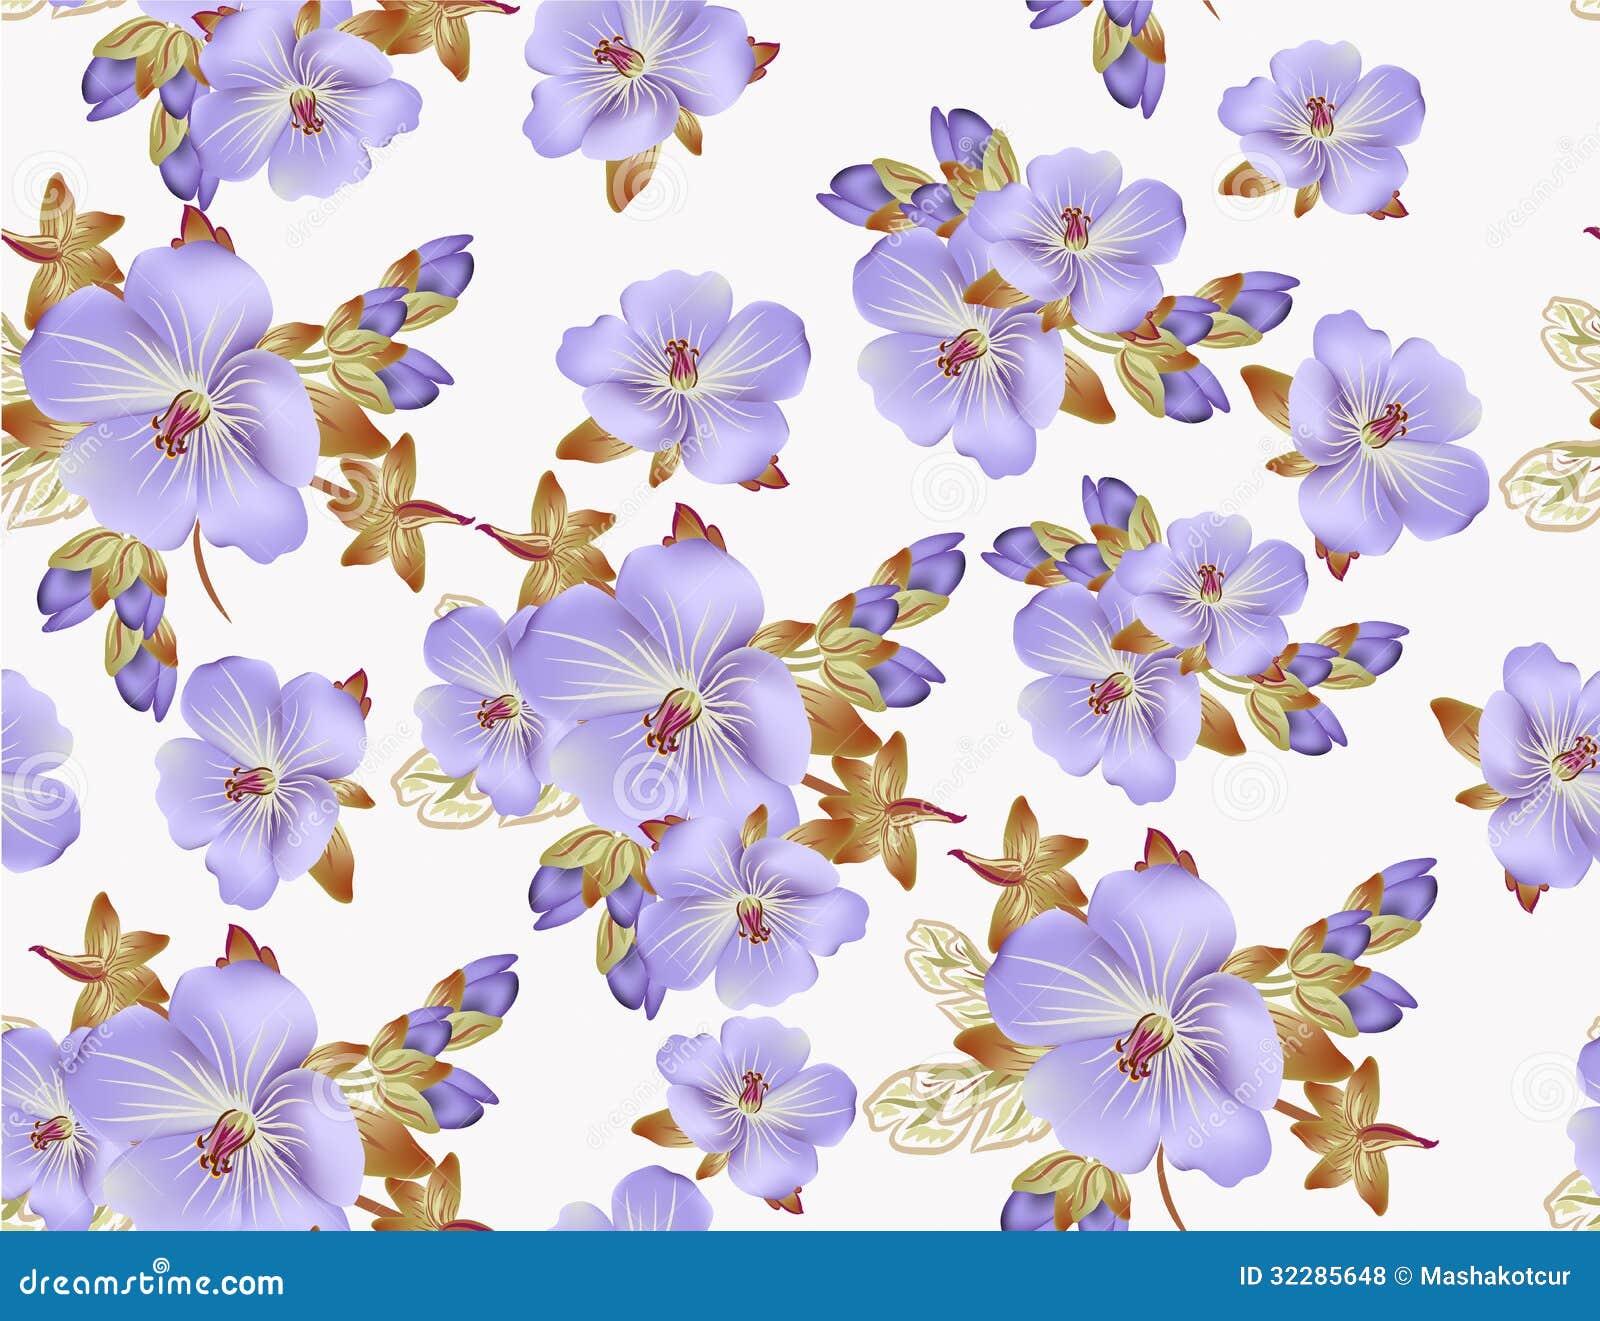 beautiful floral wallpaper designs - photo #20